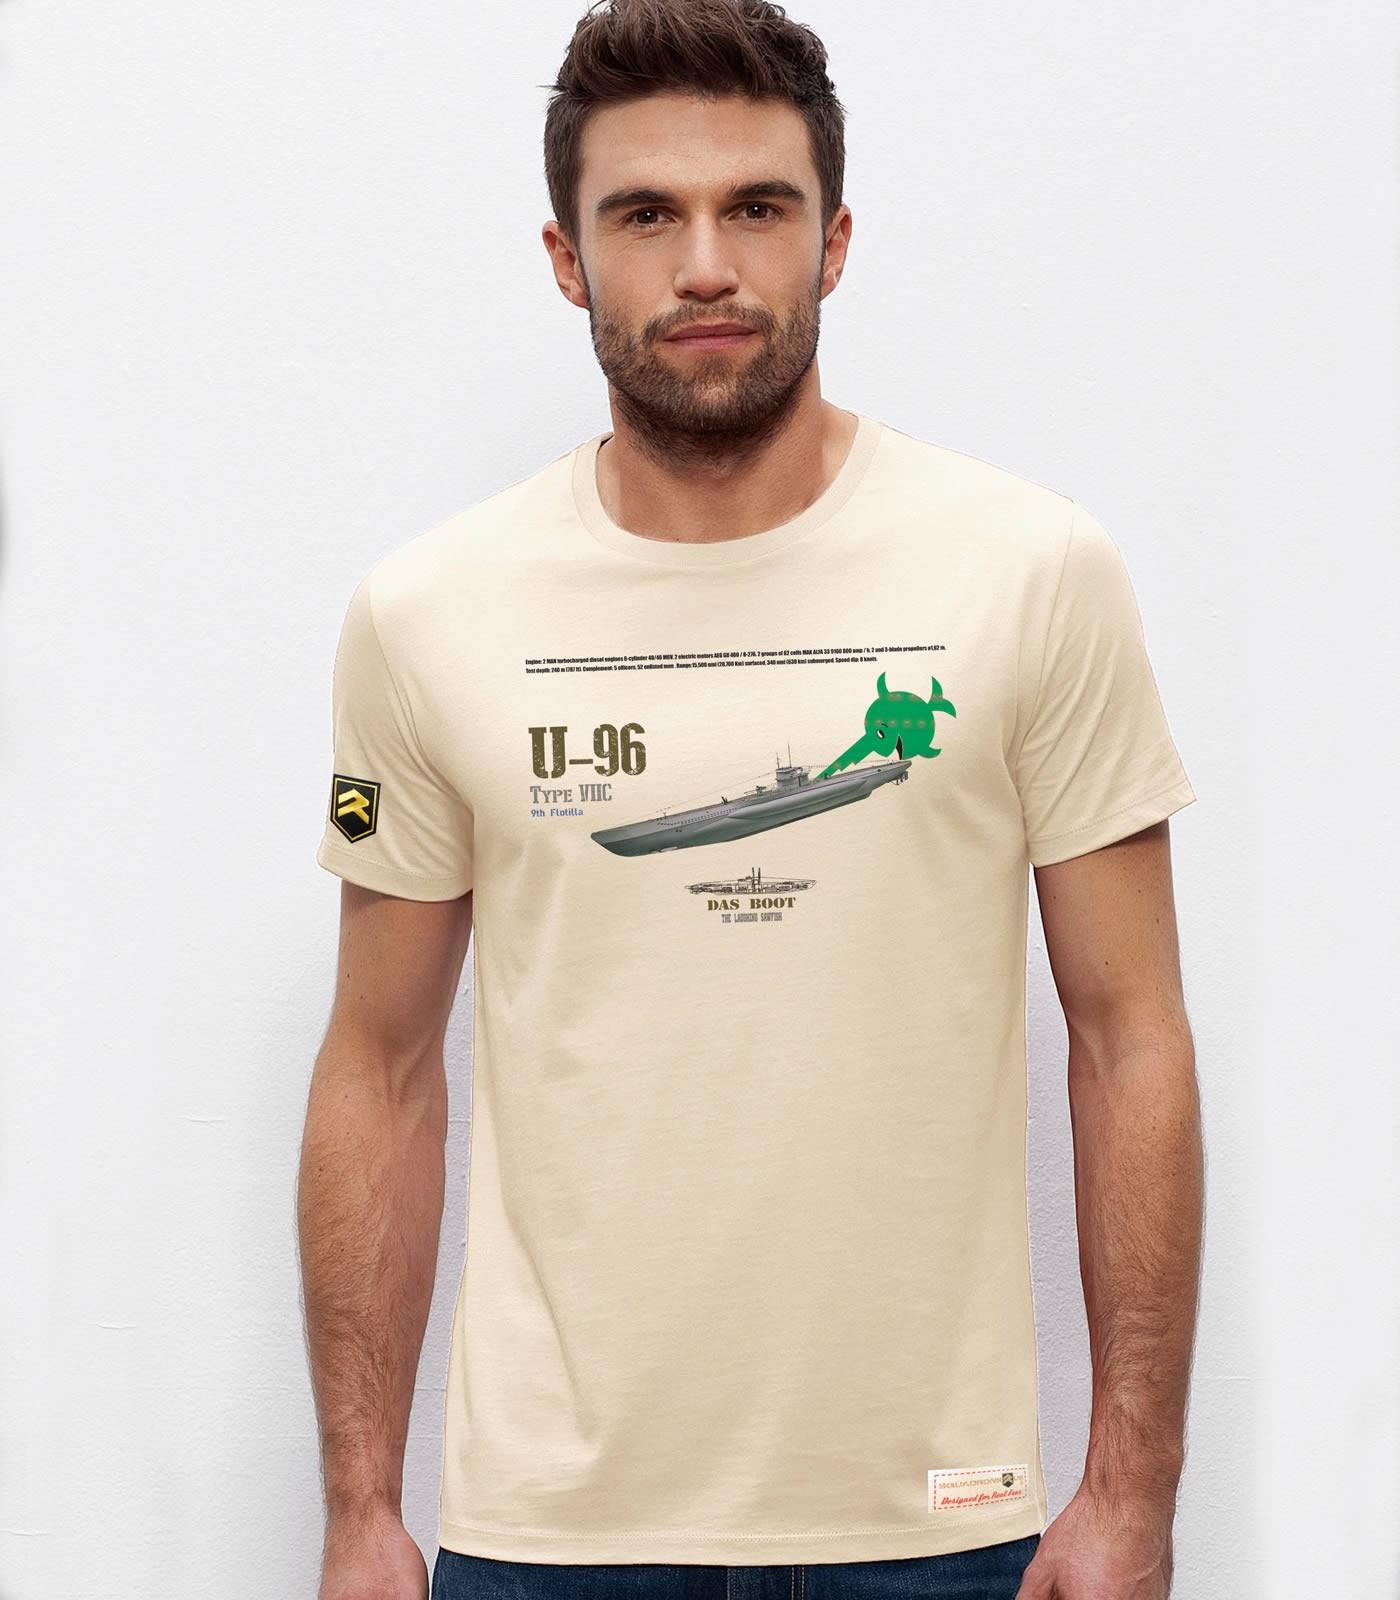 German Submarine U-96 DAS BOOT T-Shirt